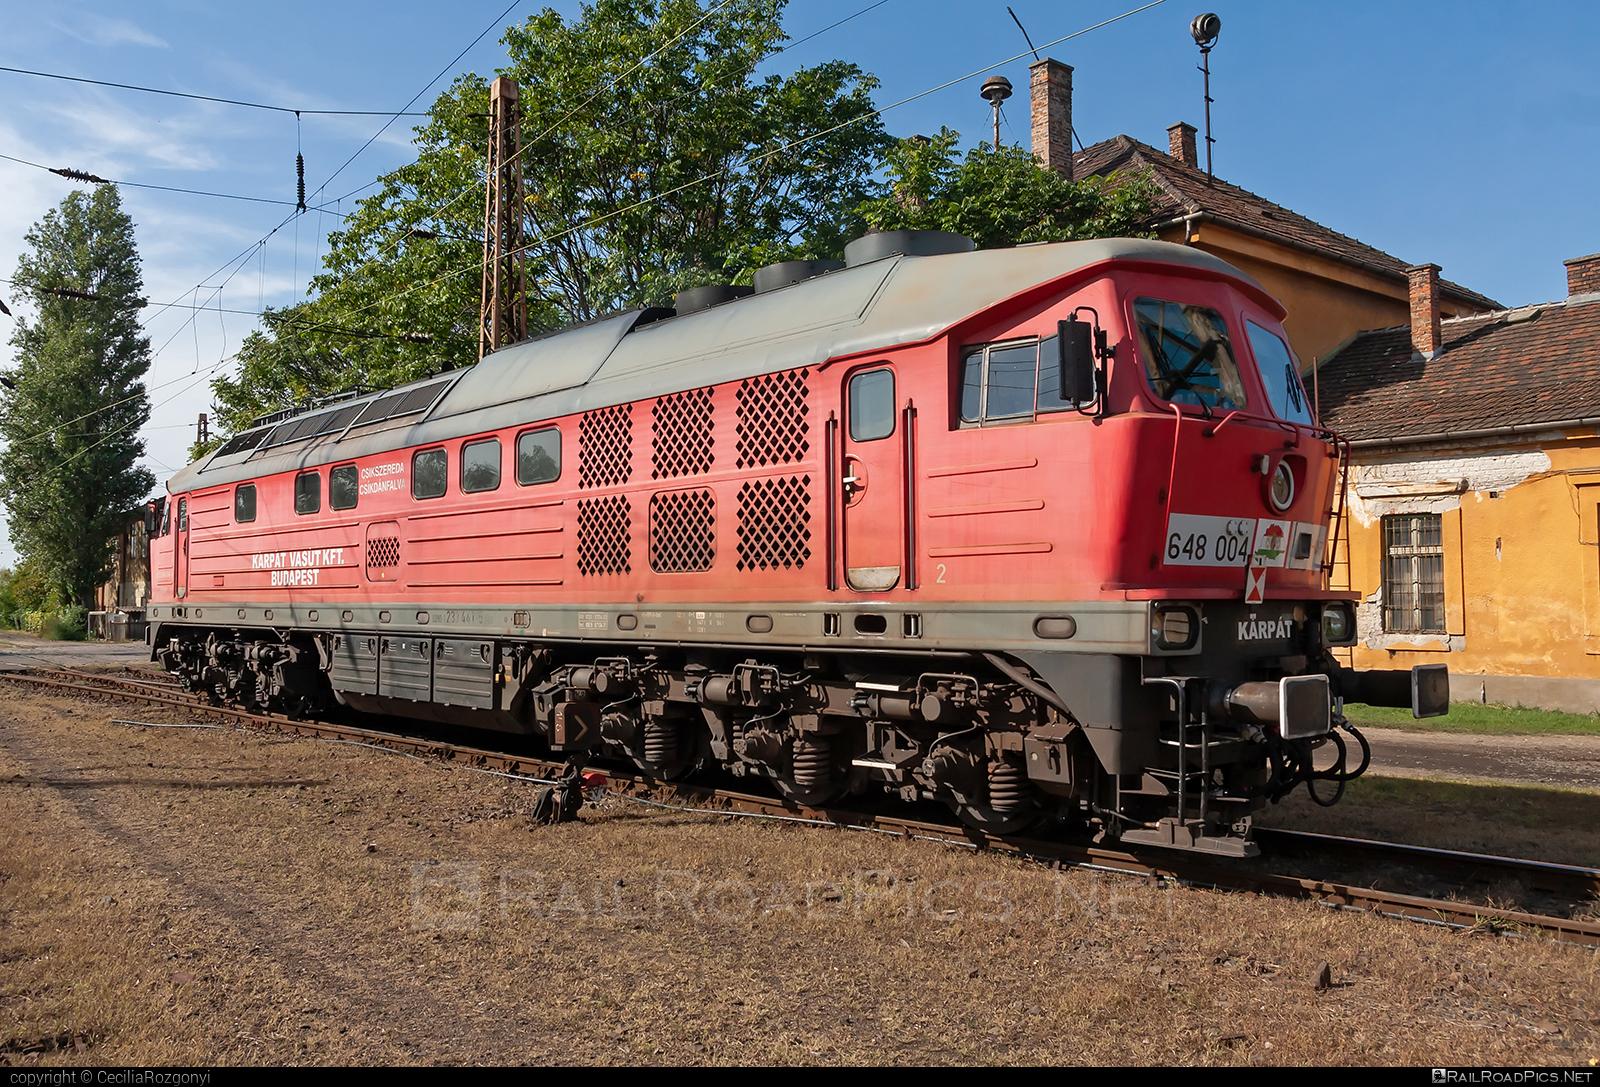 Lugansk TE109 - 648 004 operated by KÁRPÁT Vasút Kft #db233 #ltz #ltzte109 #ludmila #ludmilla #lugansk #luganskte109 #luganskteplovoz #luhansklocomotiveworks #luhanskteplovoz